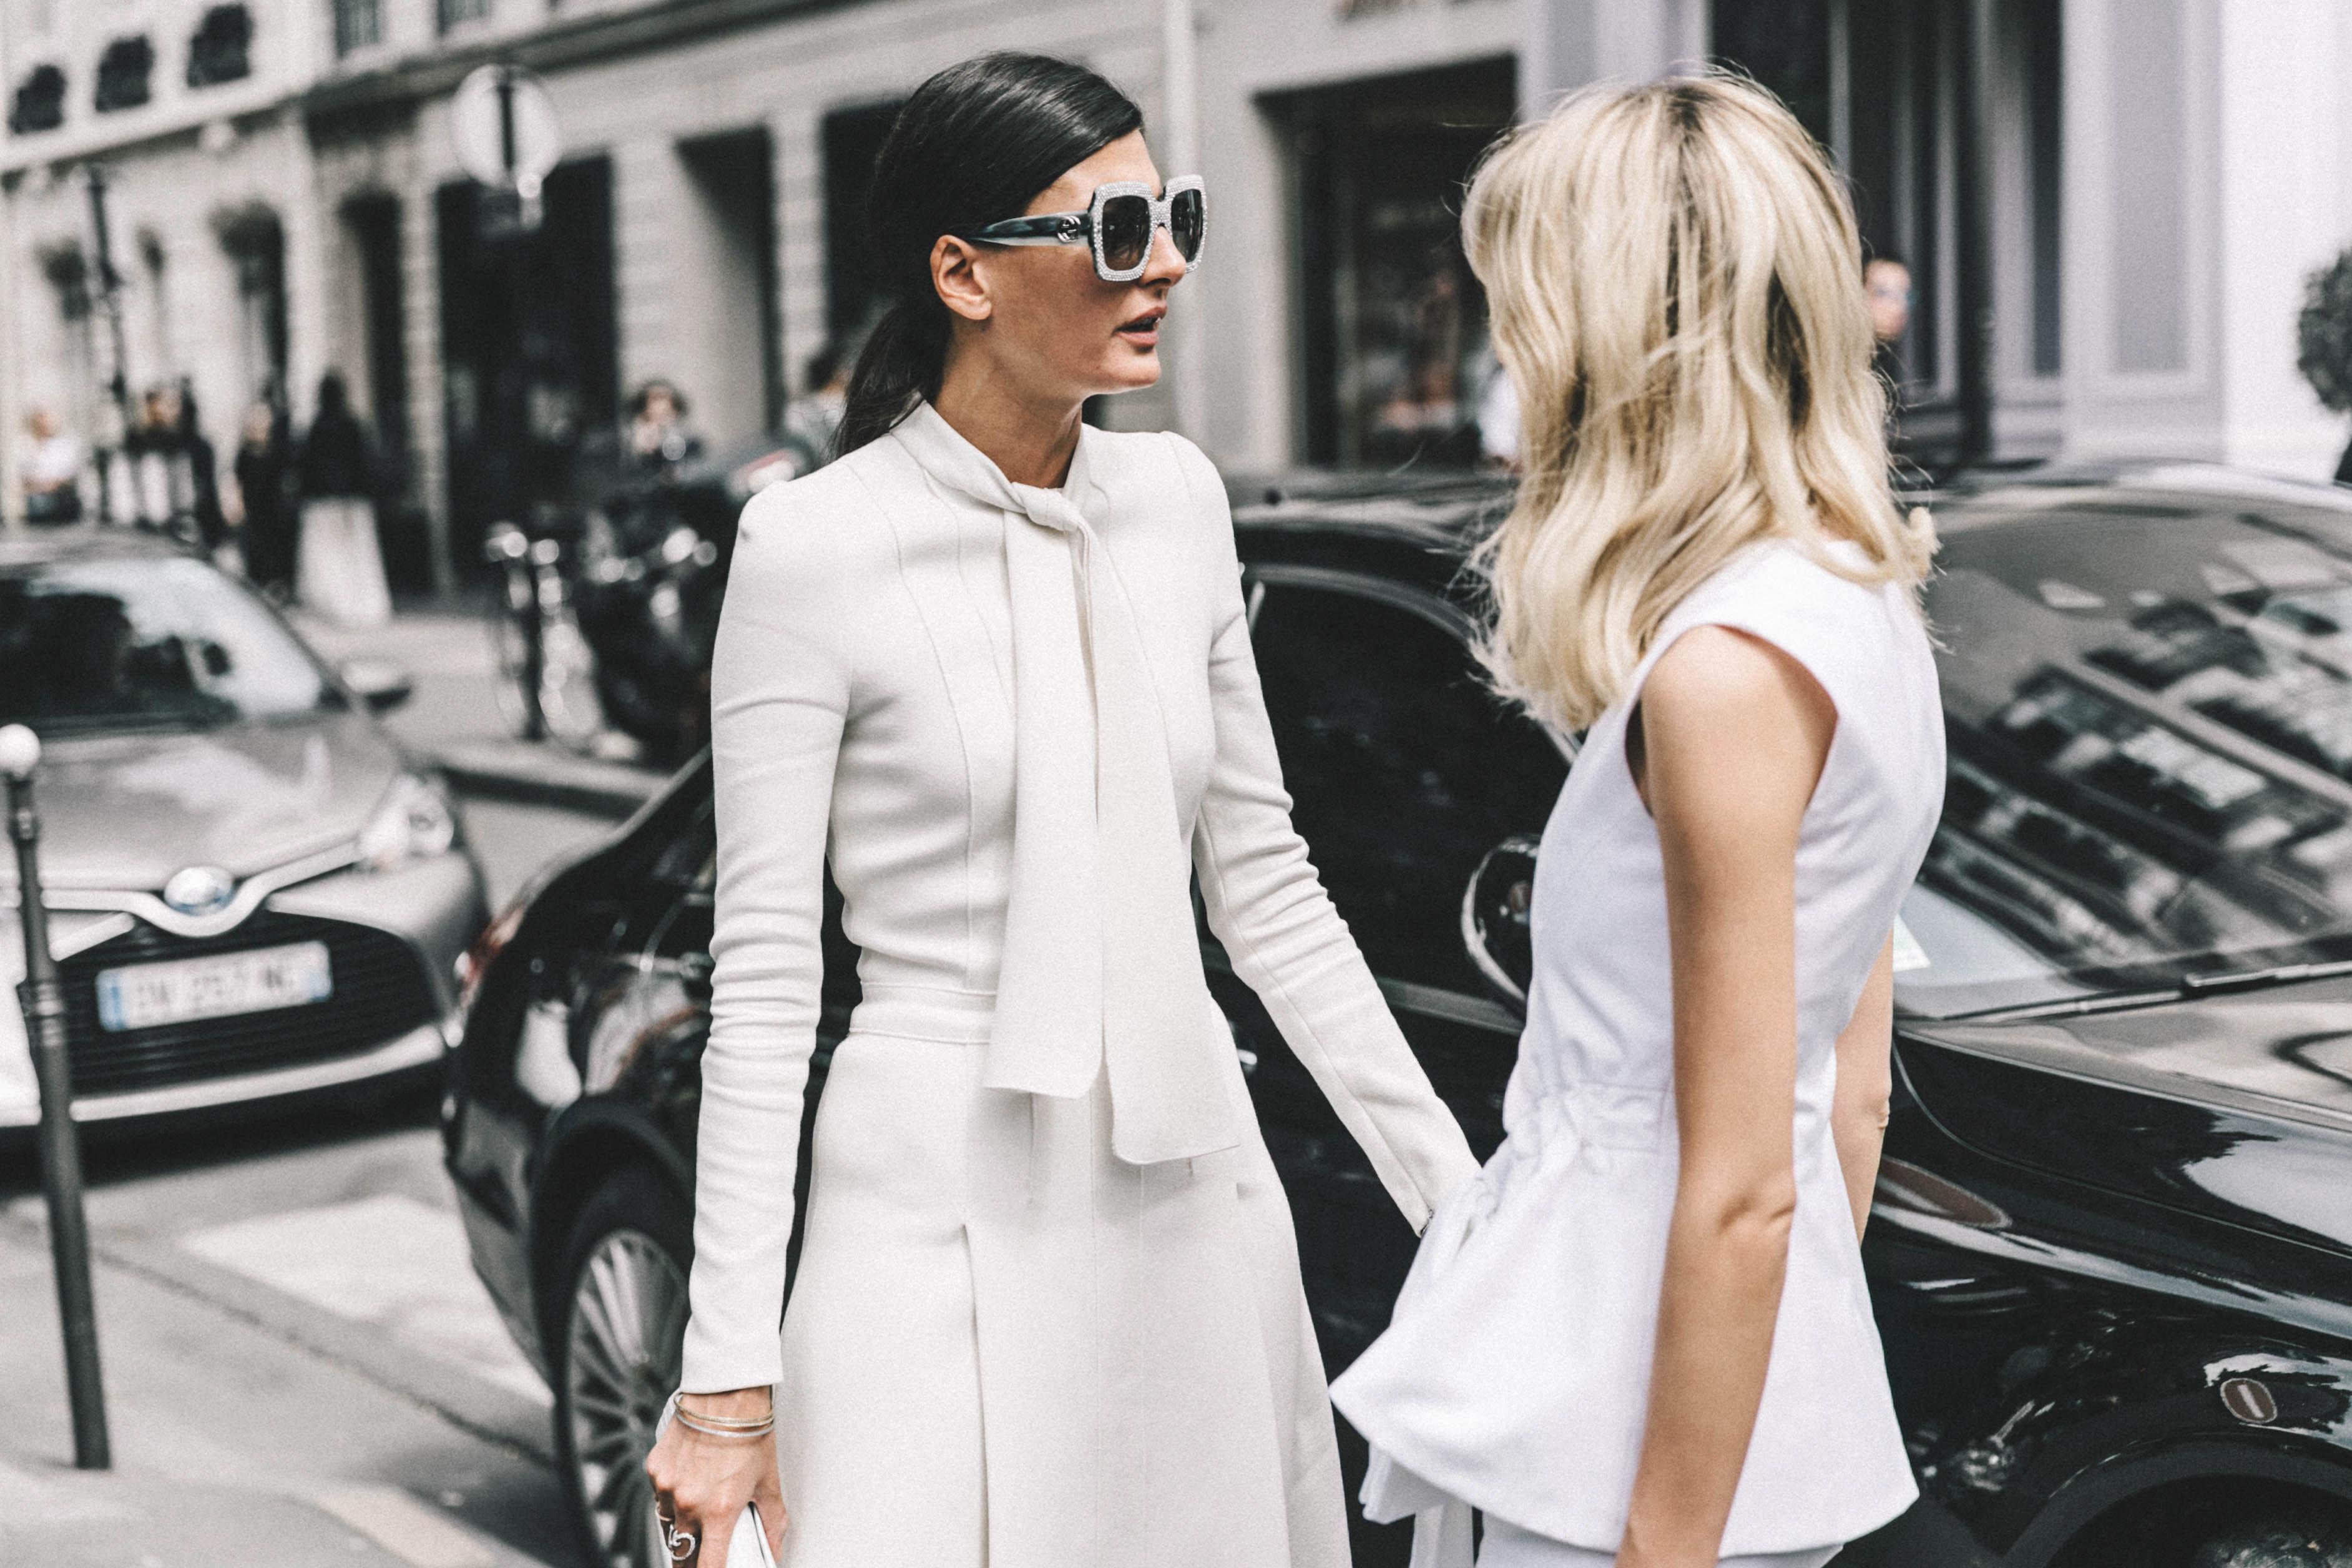 paris_couture_fashion_week-collage_vintage-129